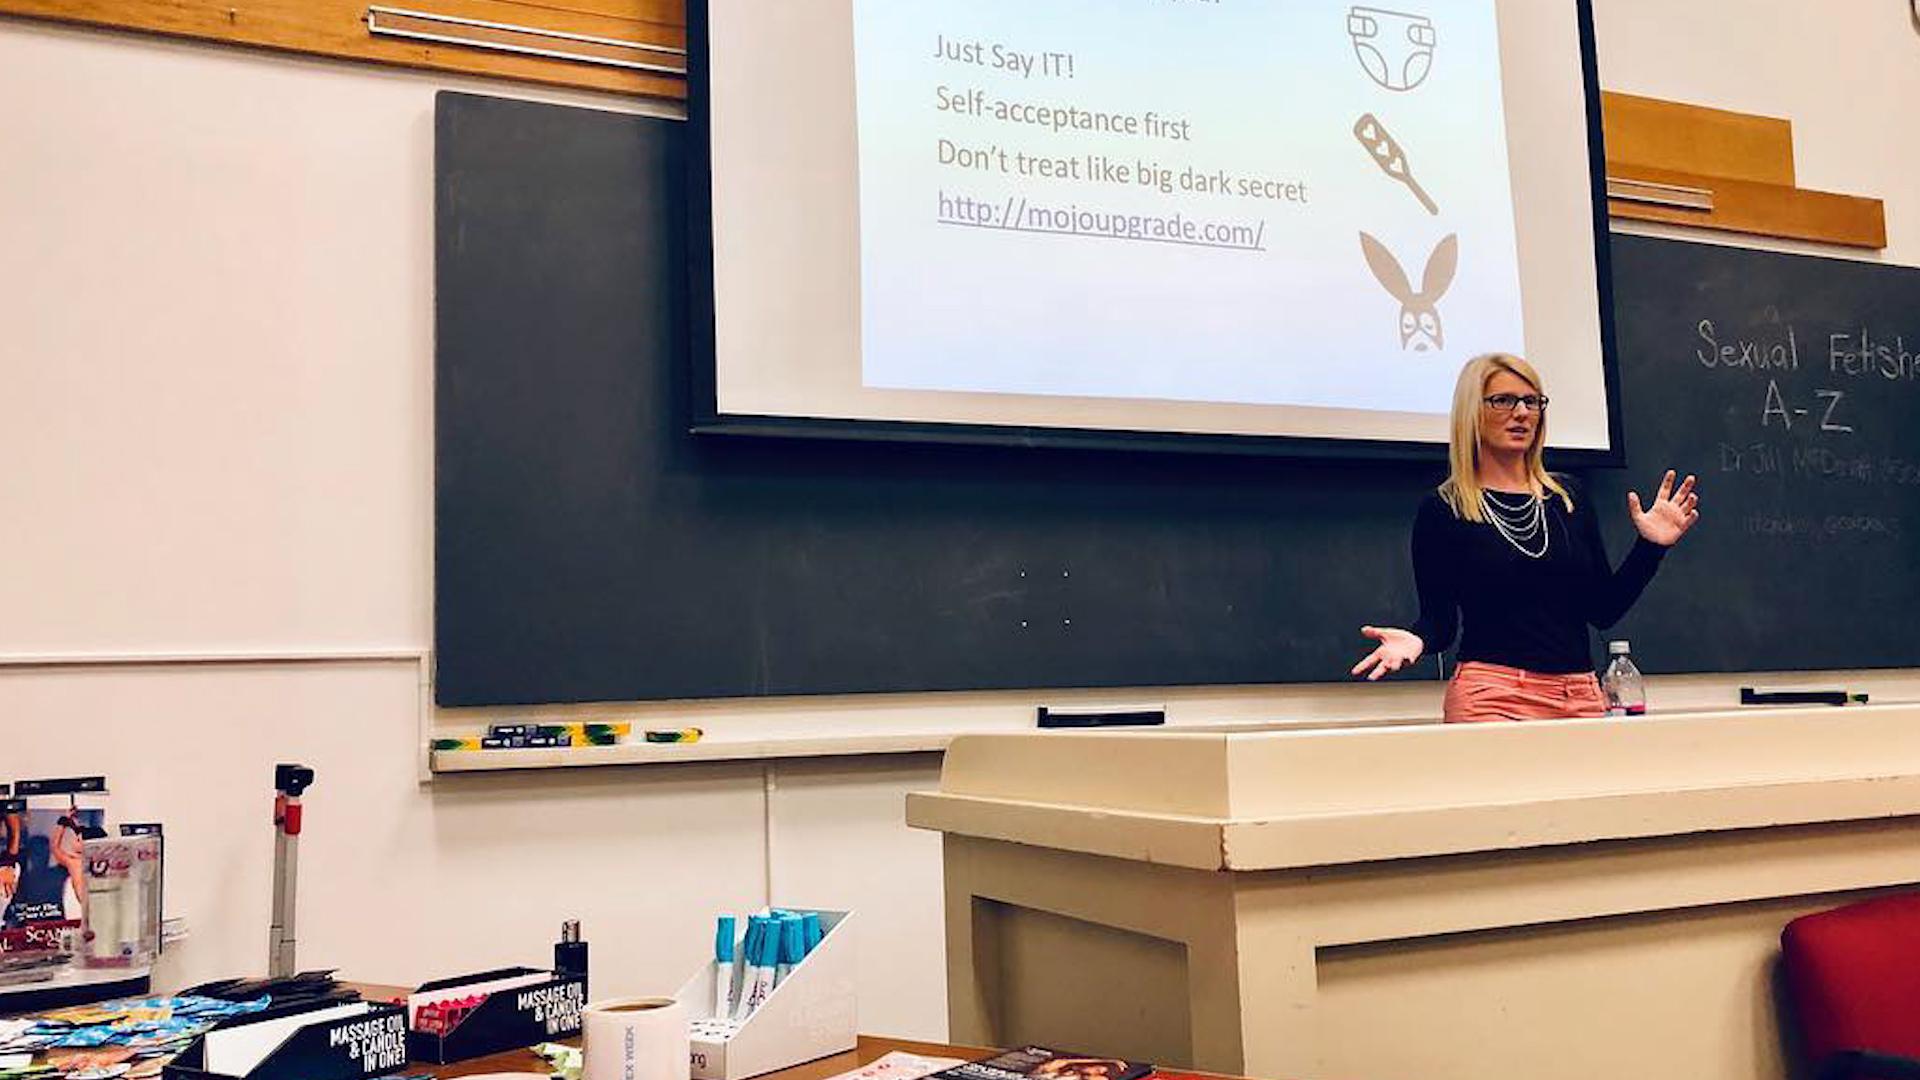 Edukacja seksualna na Harvardzie